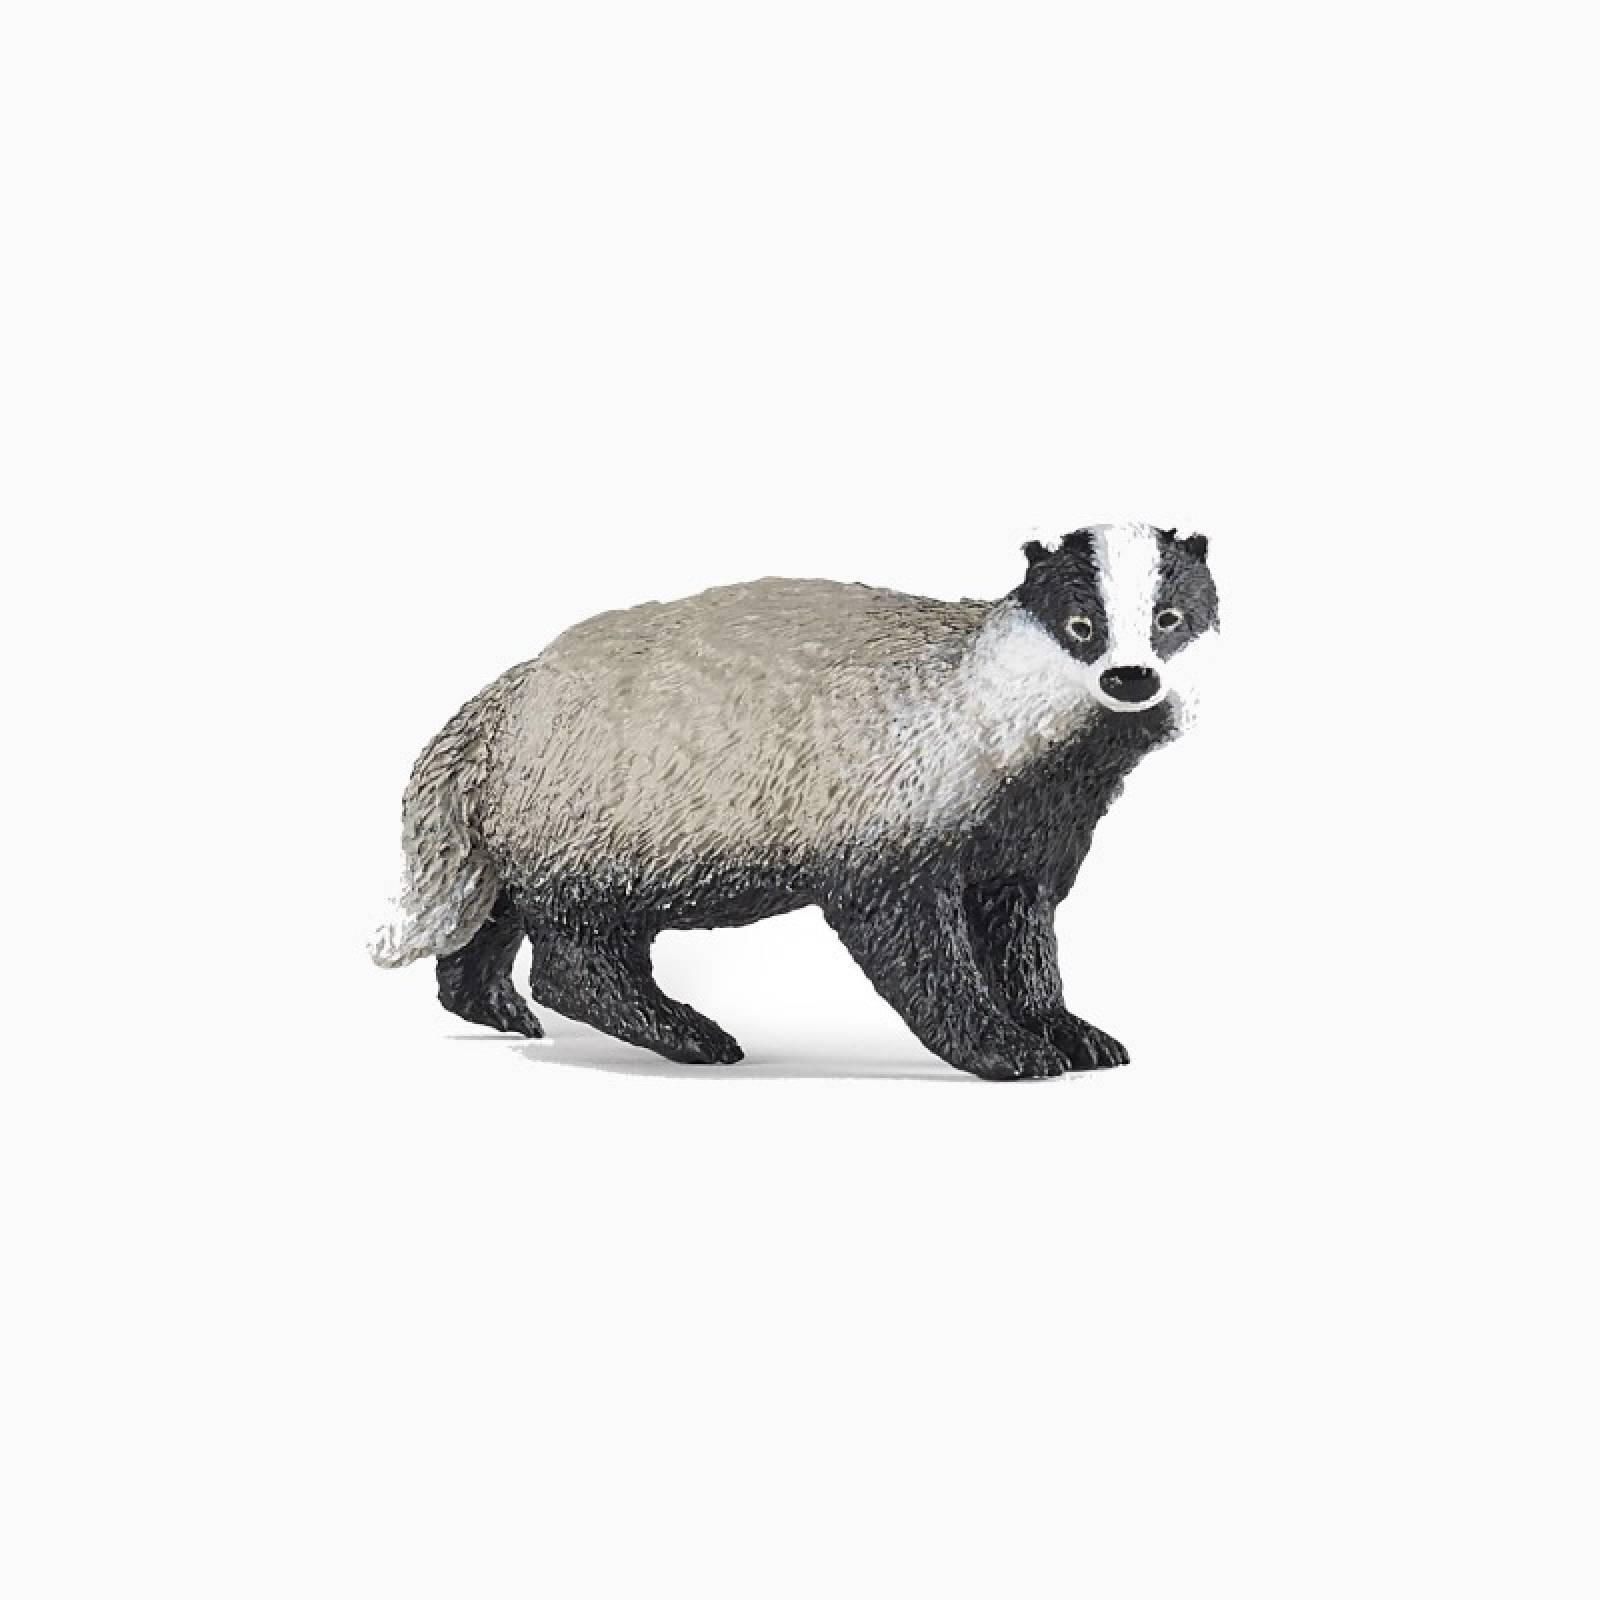 Badger - Papo Farm Animal Figure